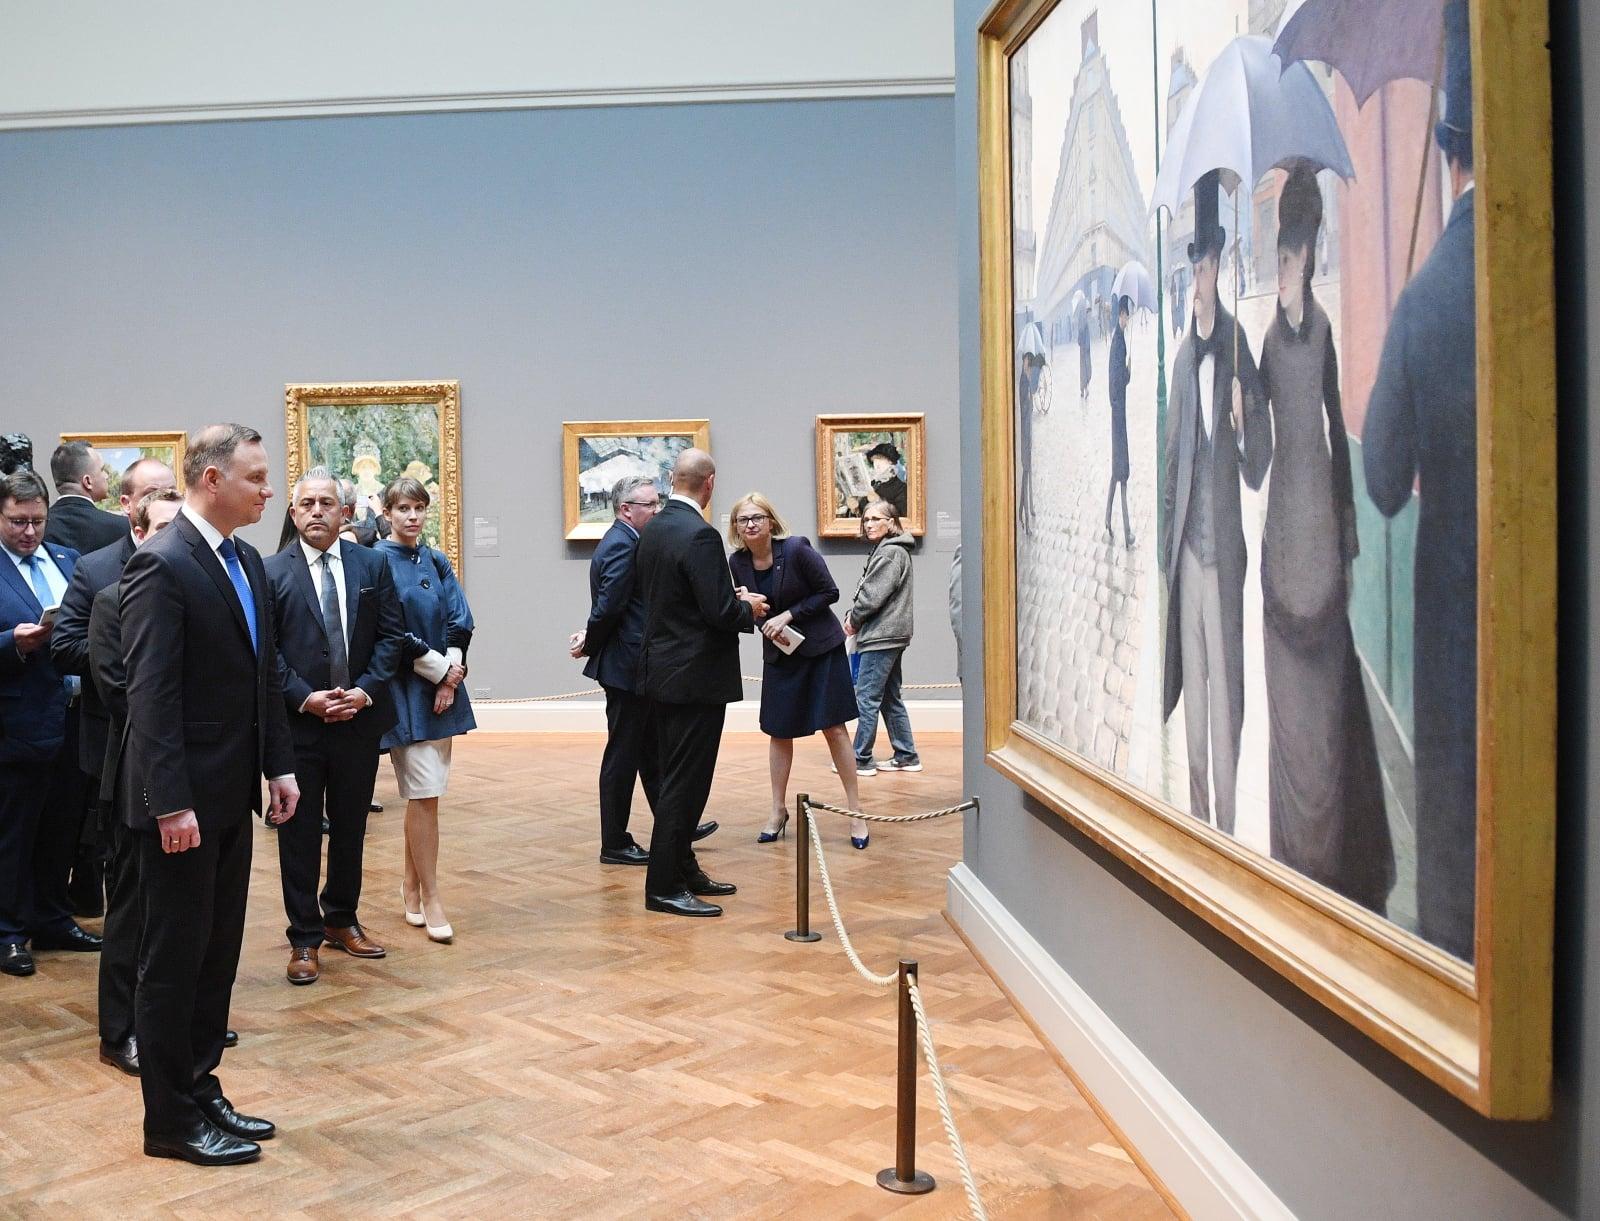 Chicago, USA, 18.05.2018. Prezydent Andrzej Duda (L) podczas wizyty w The Art Institute of Chicago